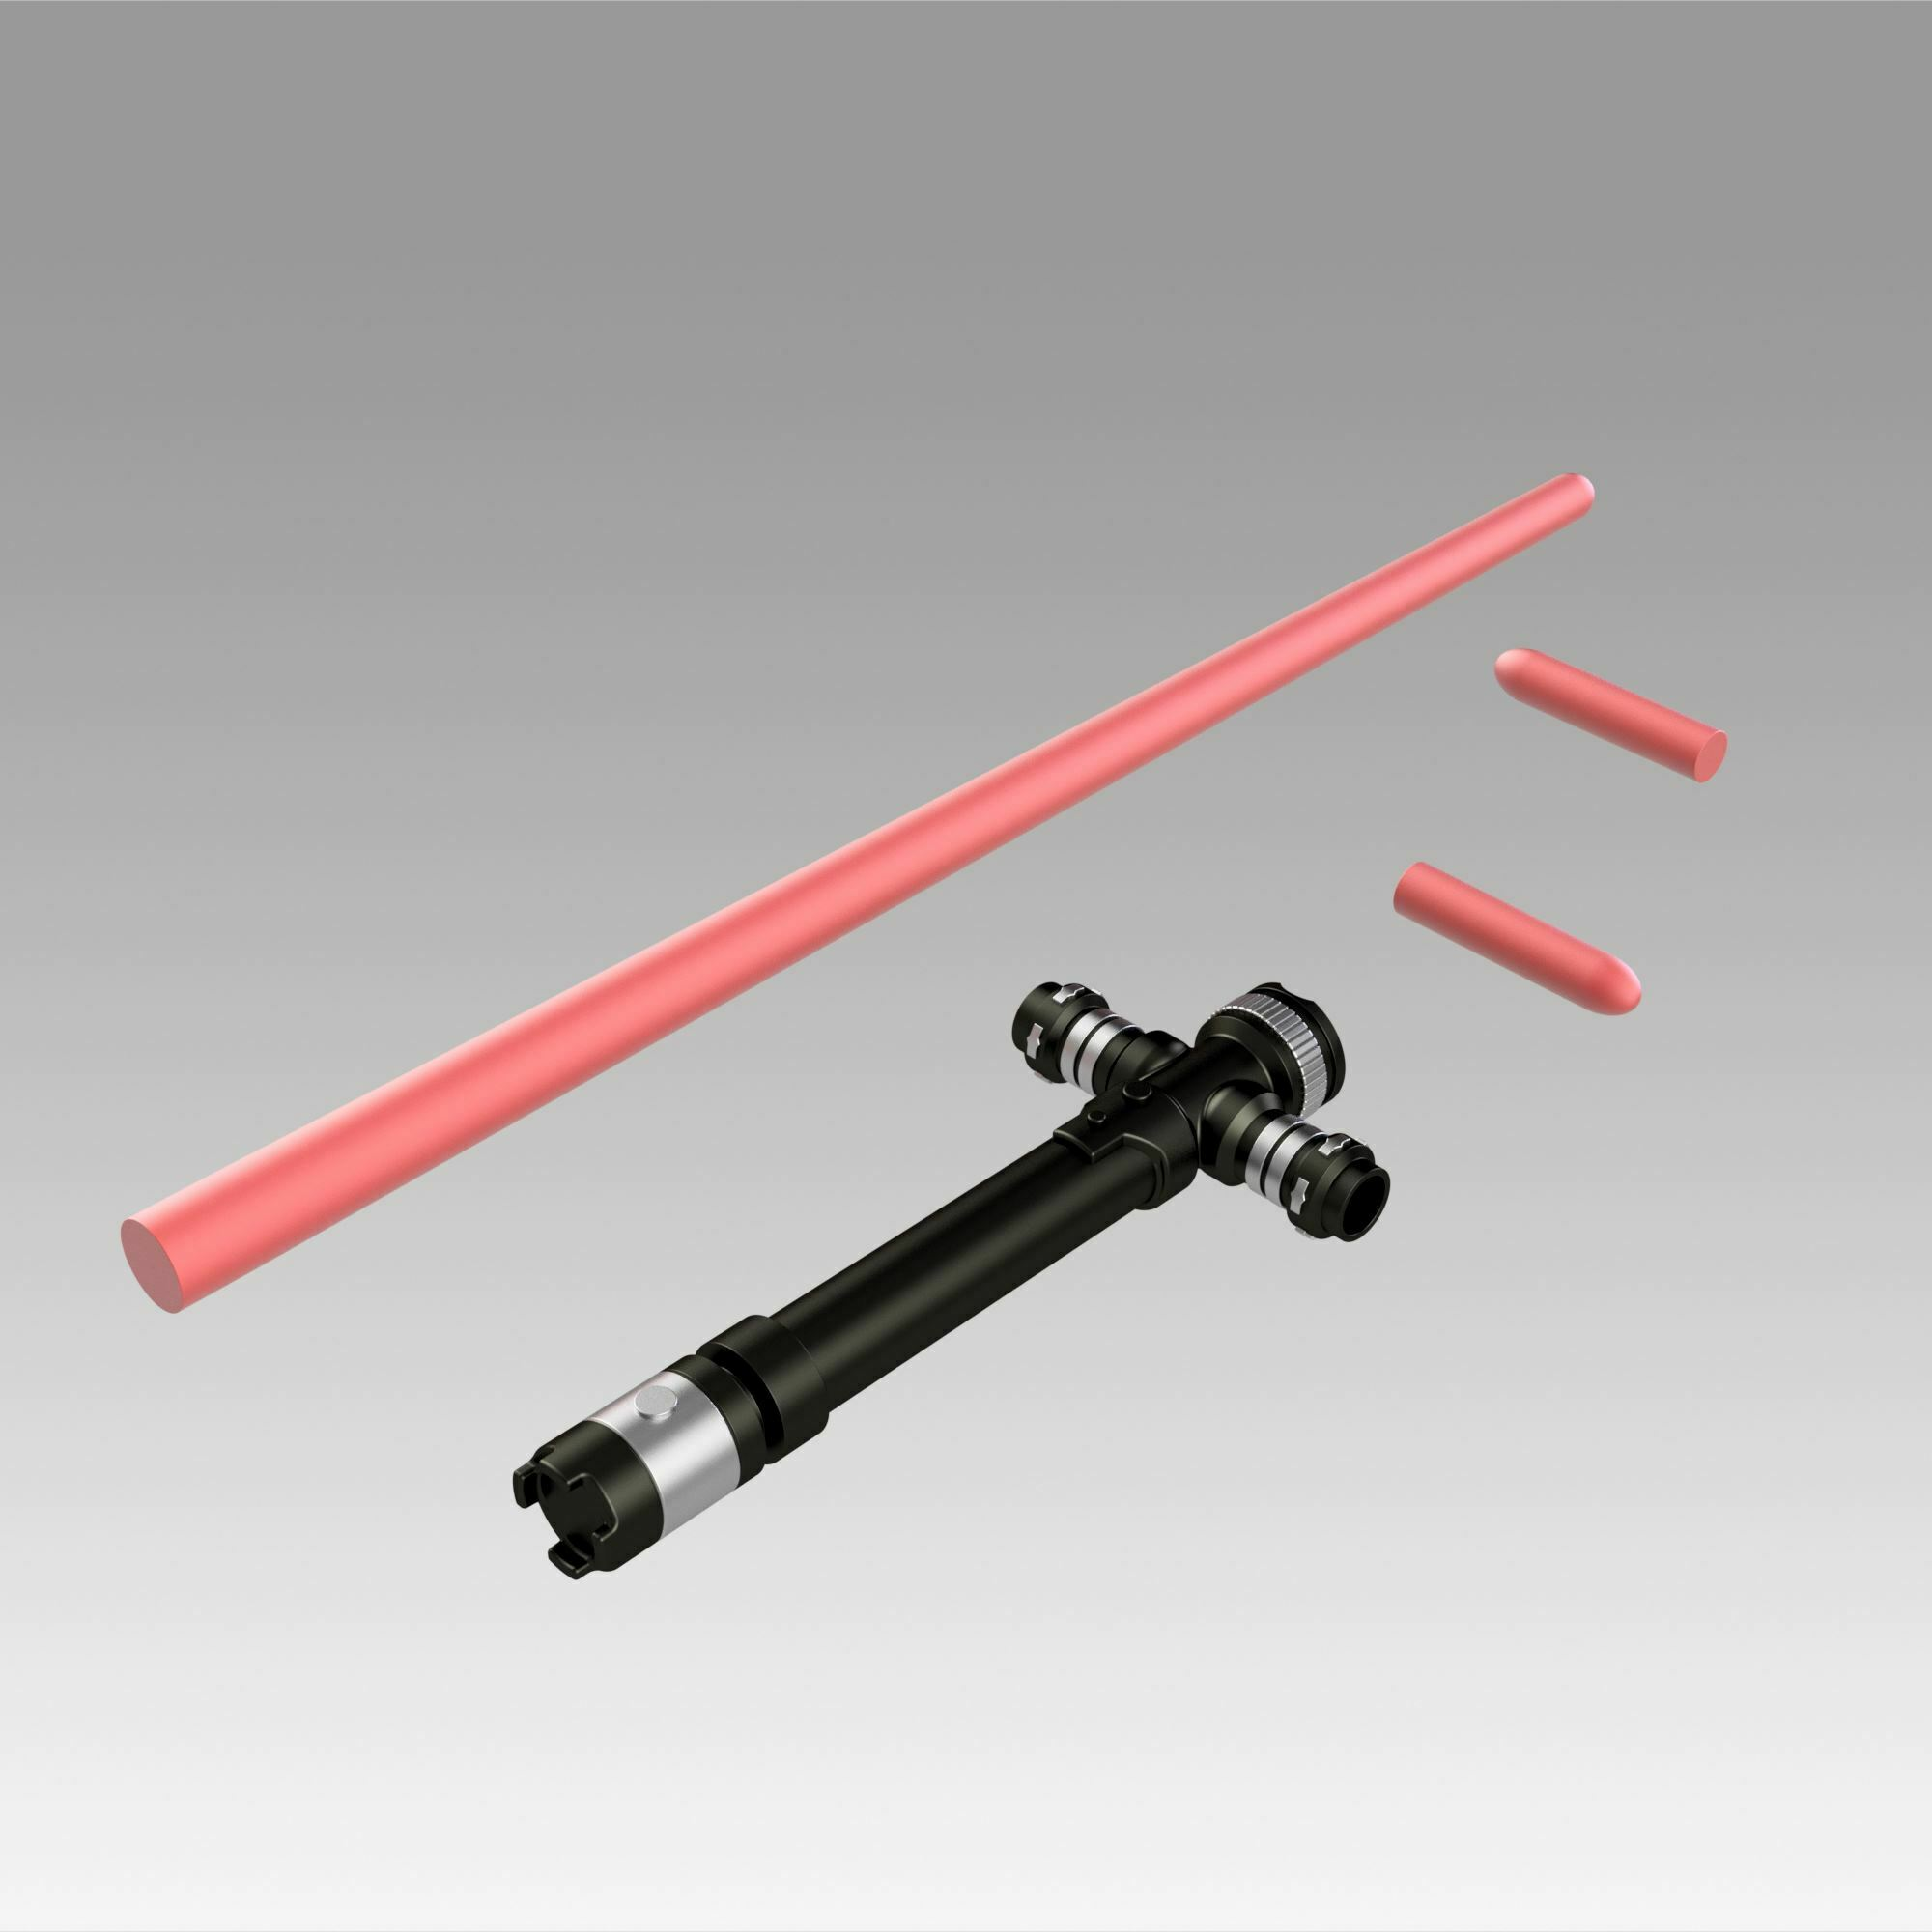 10.jpg Download OBJ file Star Wars VII The Force Awakens Kylo Ren Sword Cosplay Prop • 3D printer object, Blackeveryday